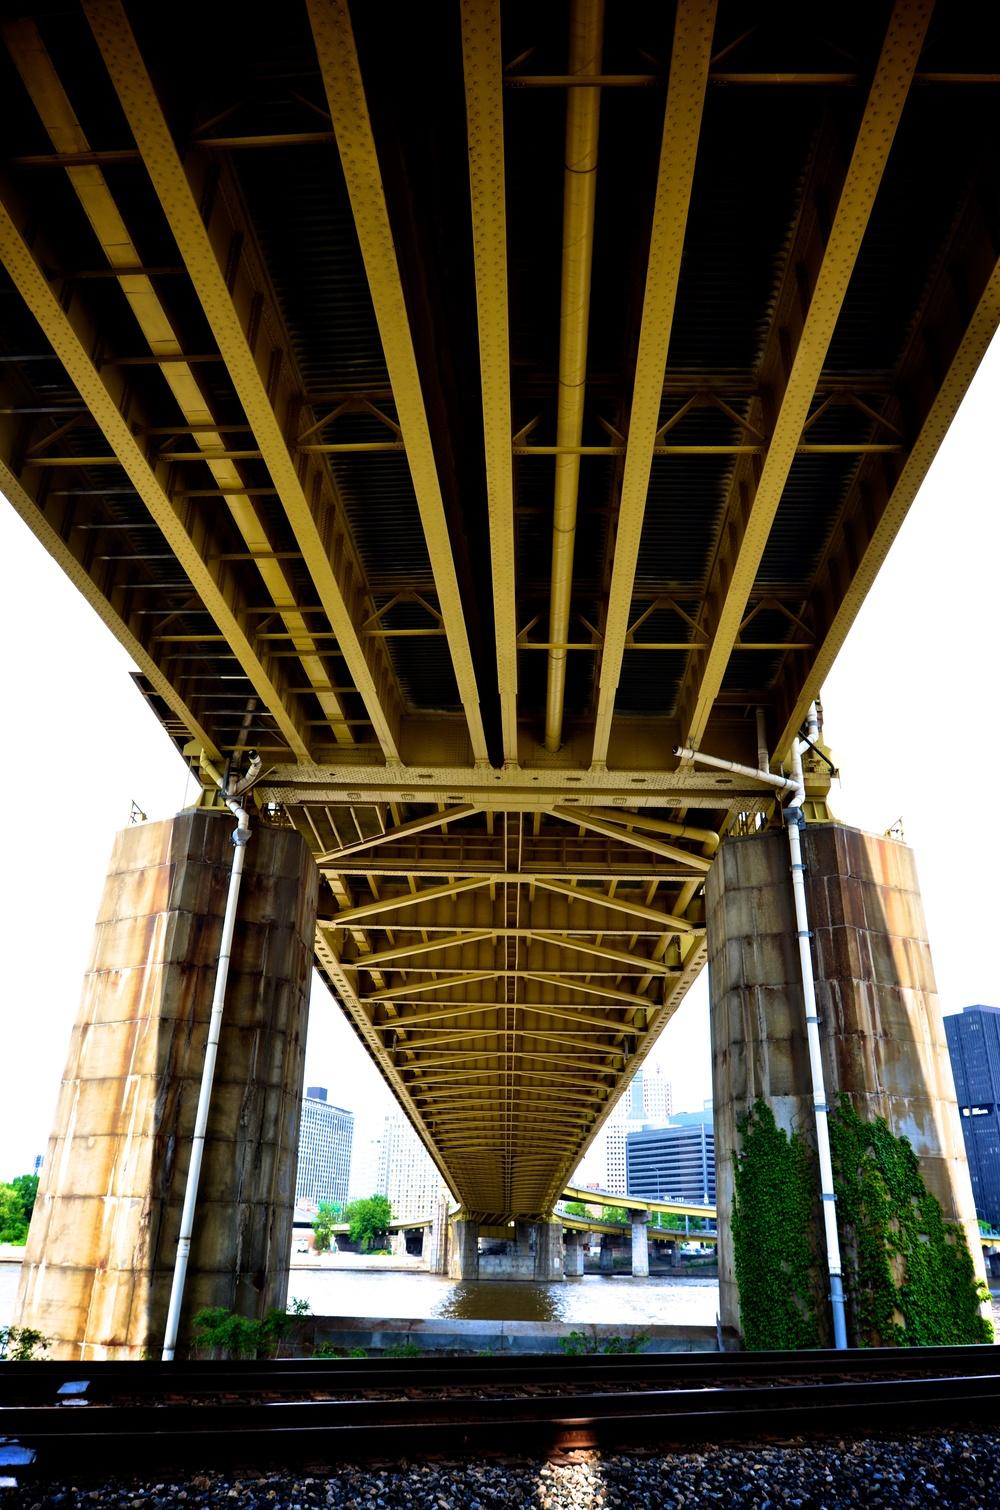 pod mostem żółtym.jpg